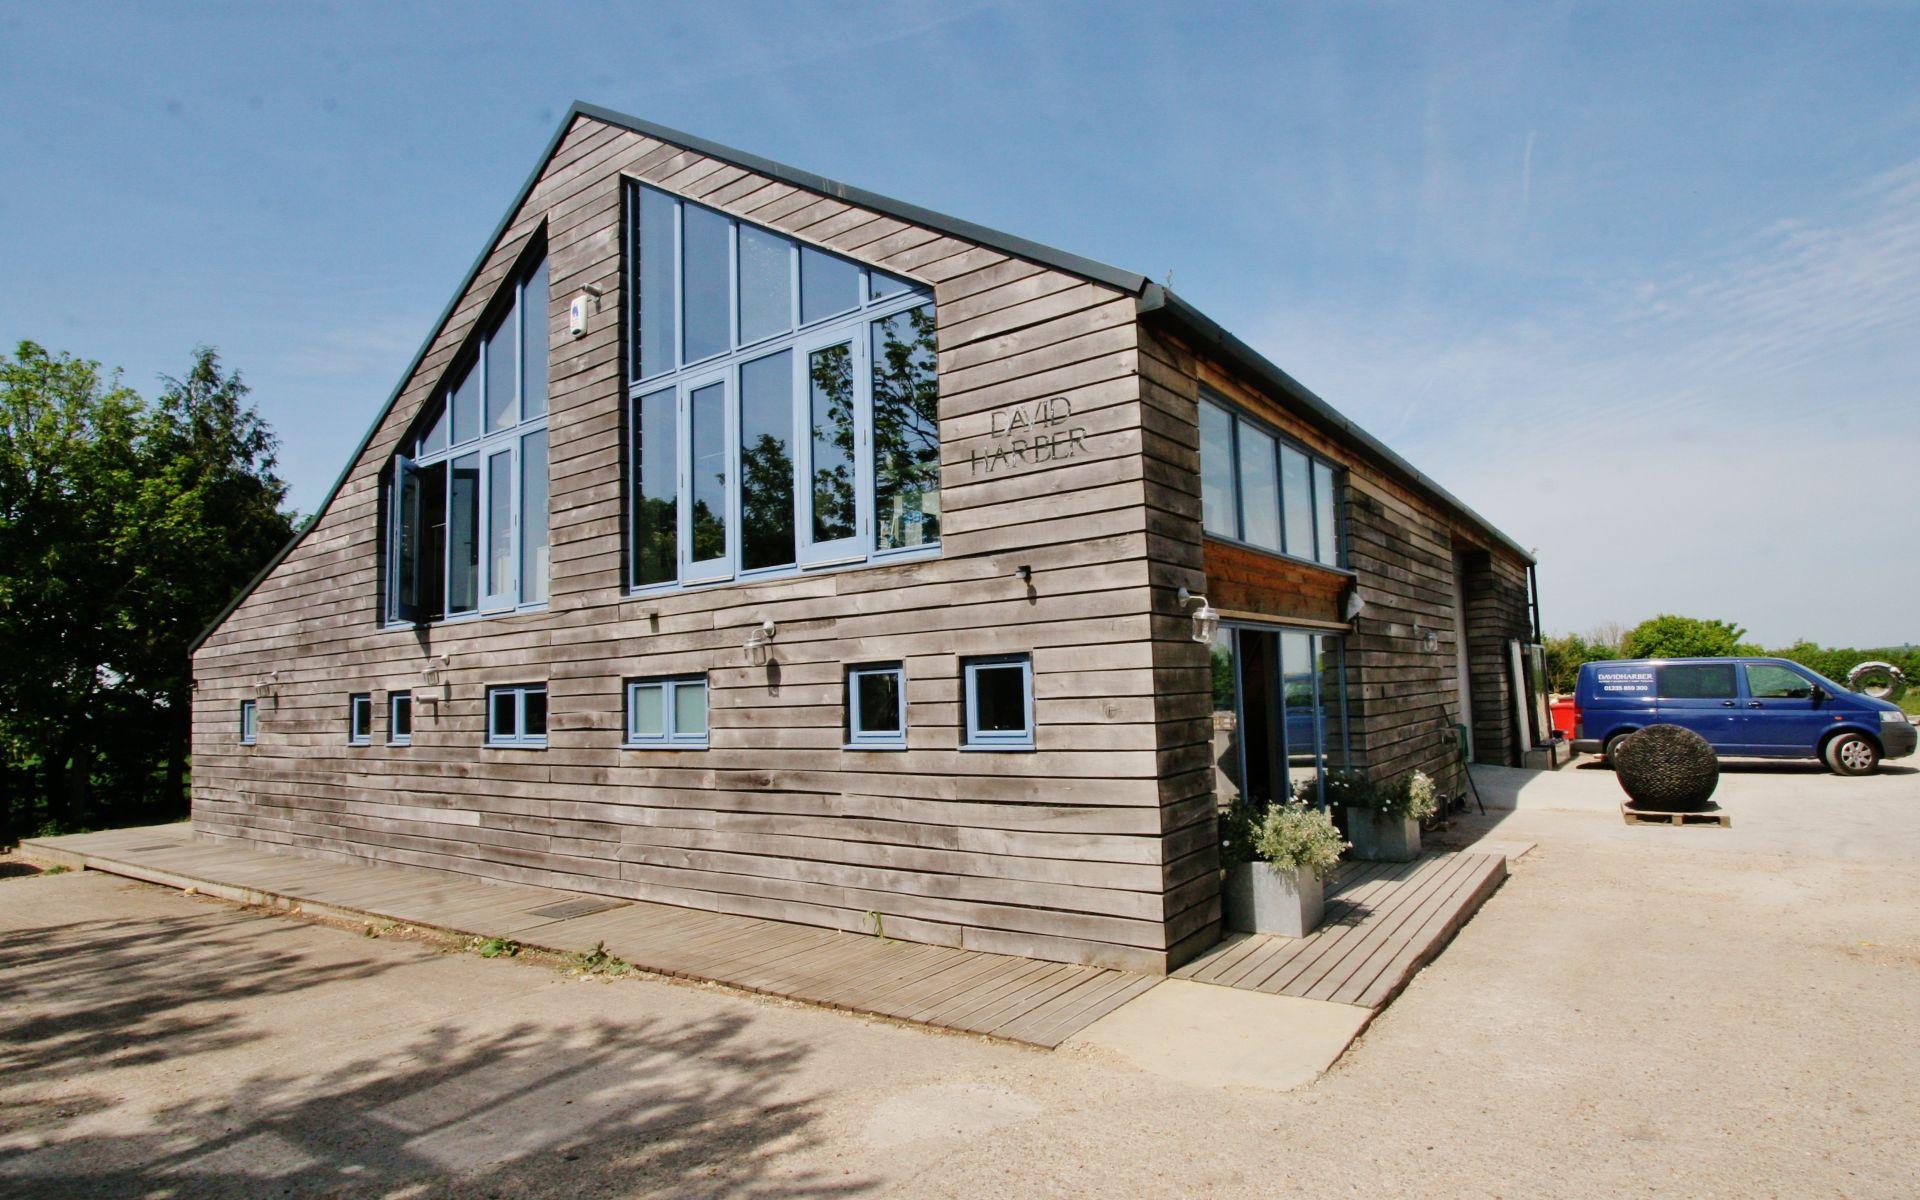 berkshire building project management services commercial project